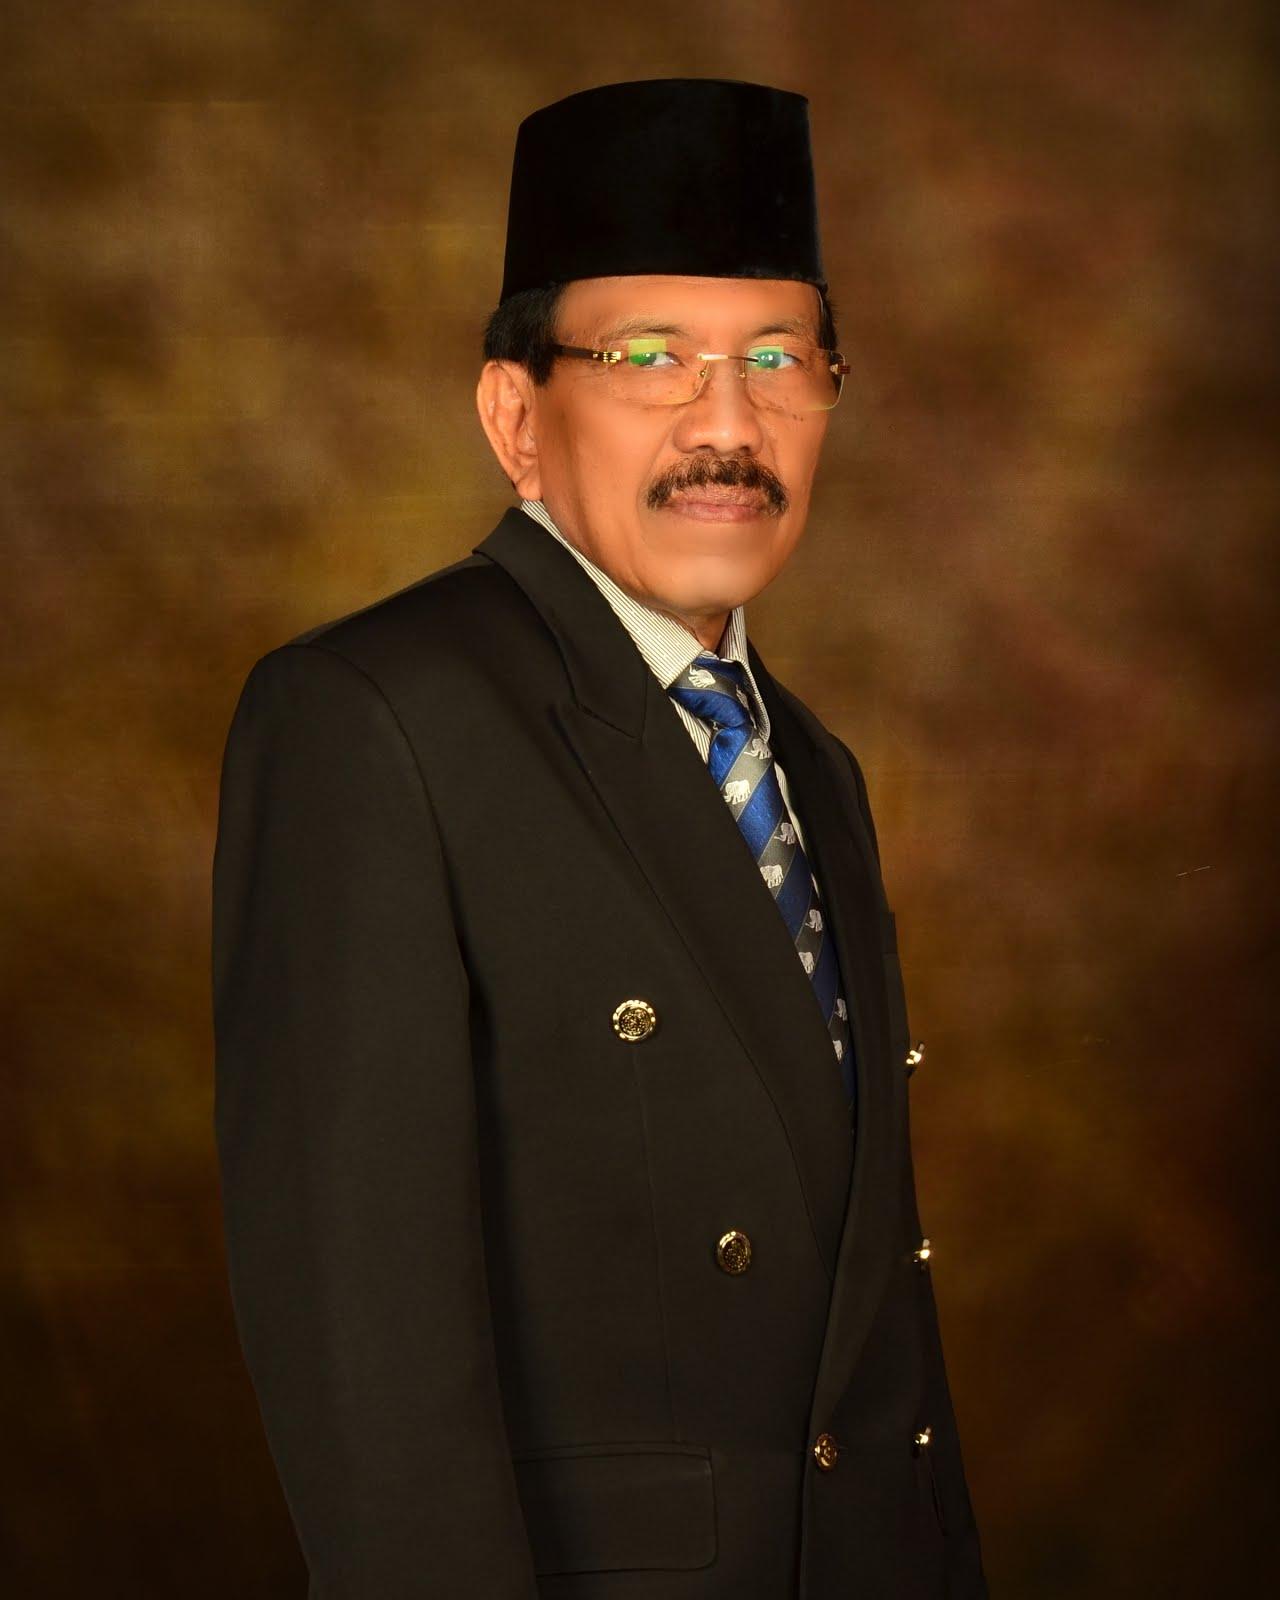 Pimpinan Fakultas Ushuluddin